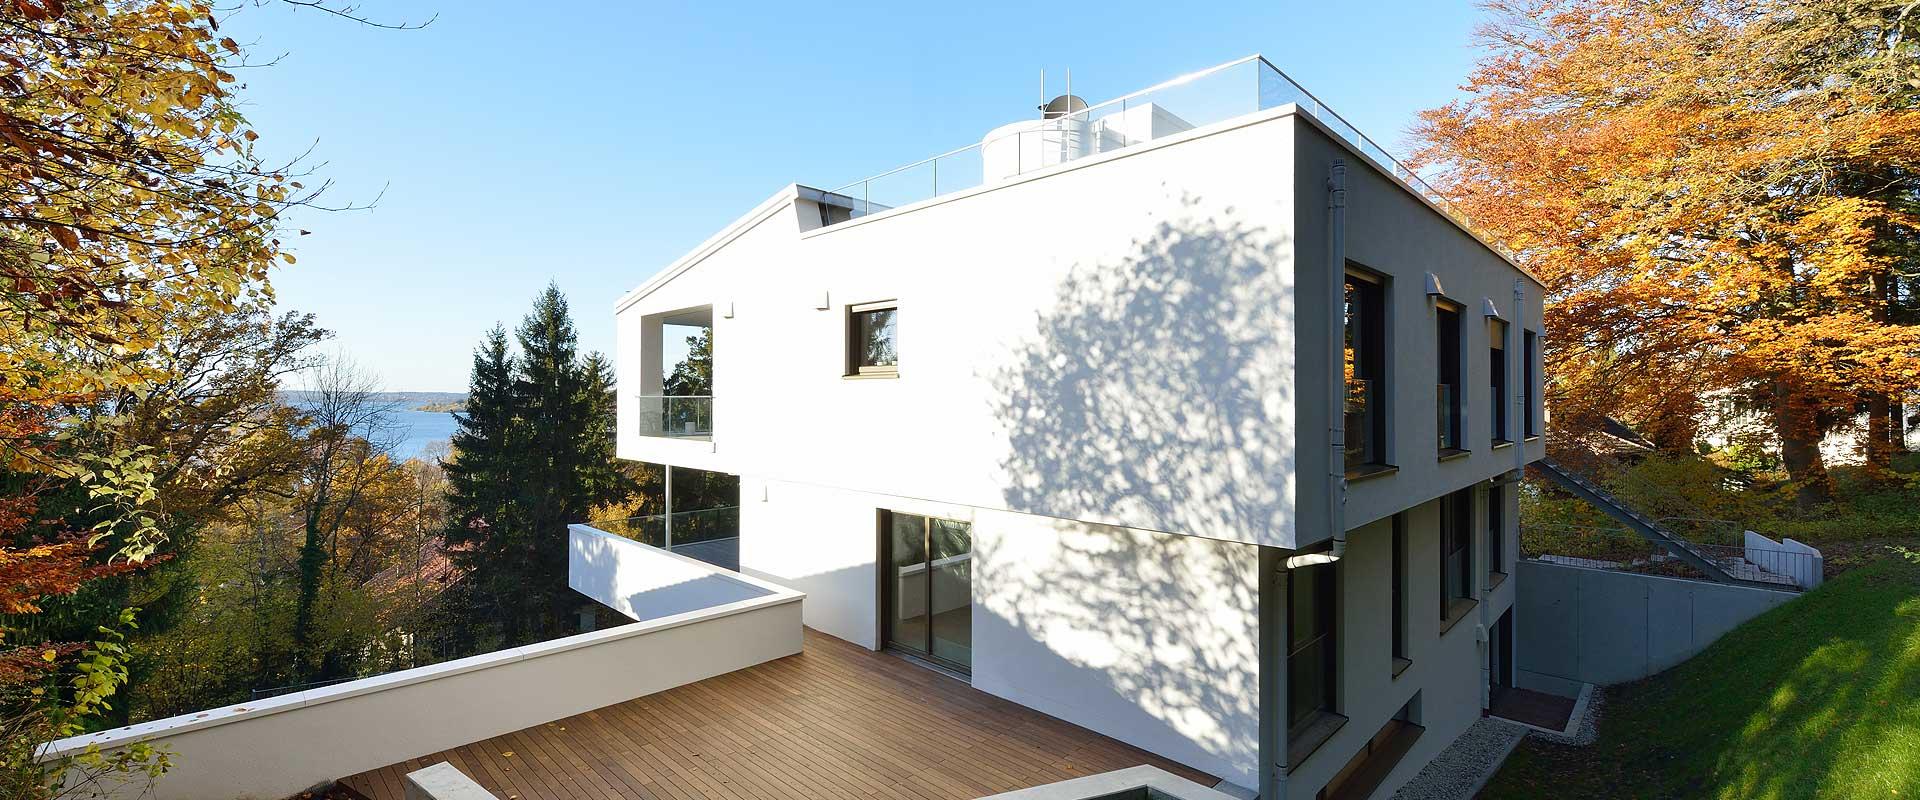 Immobilienprojekte, die begeistern